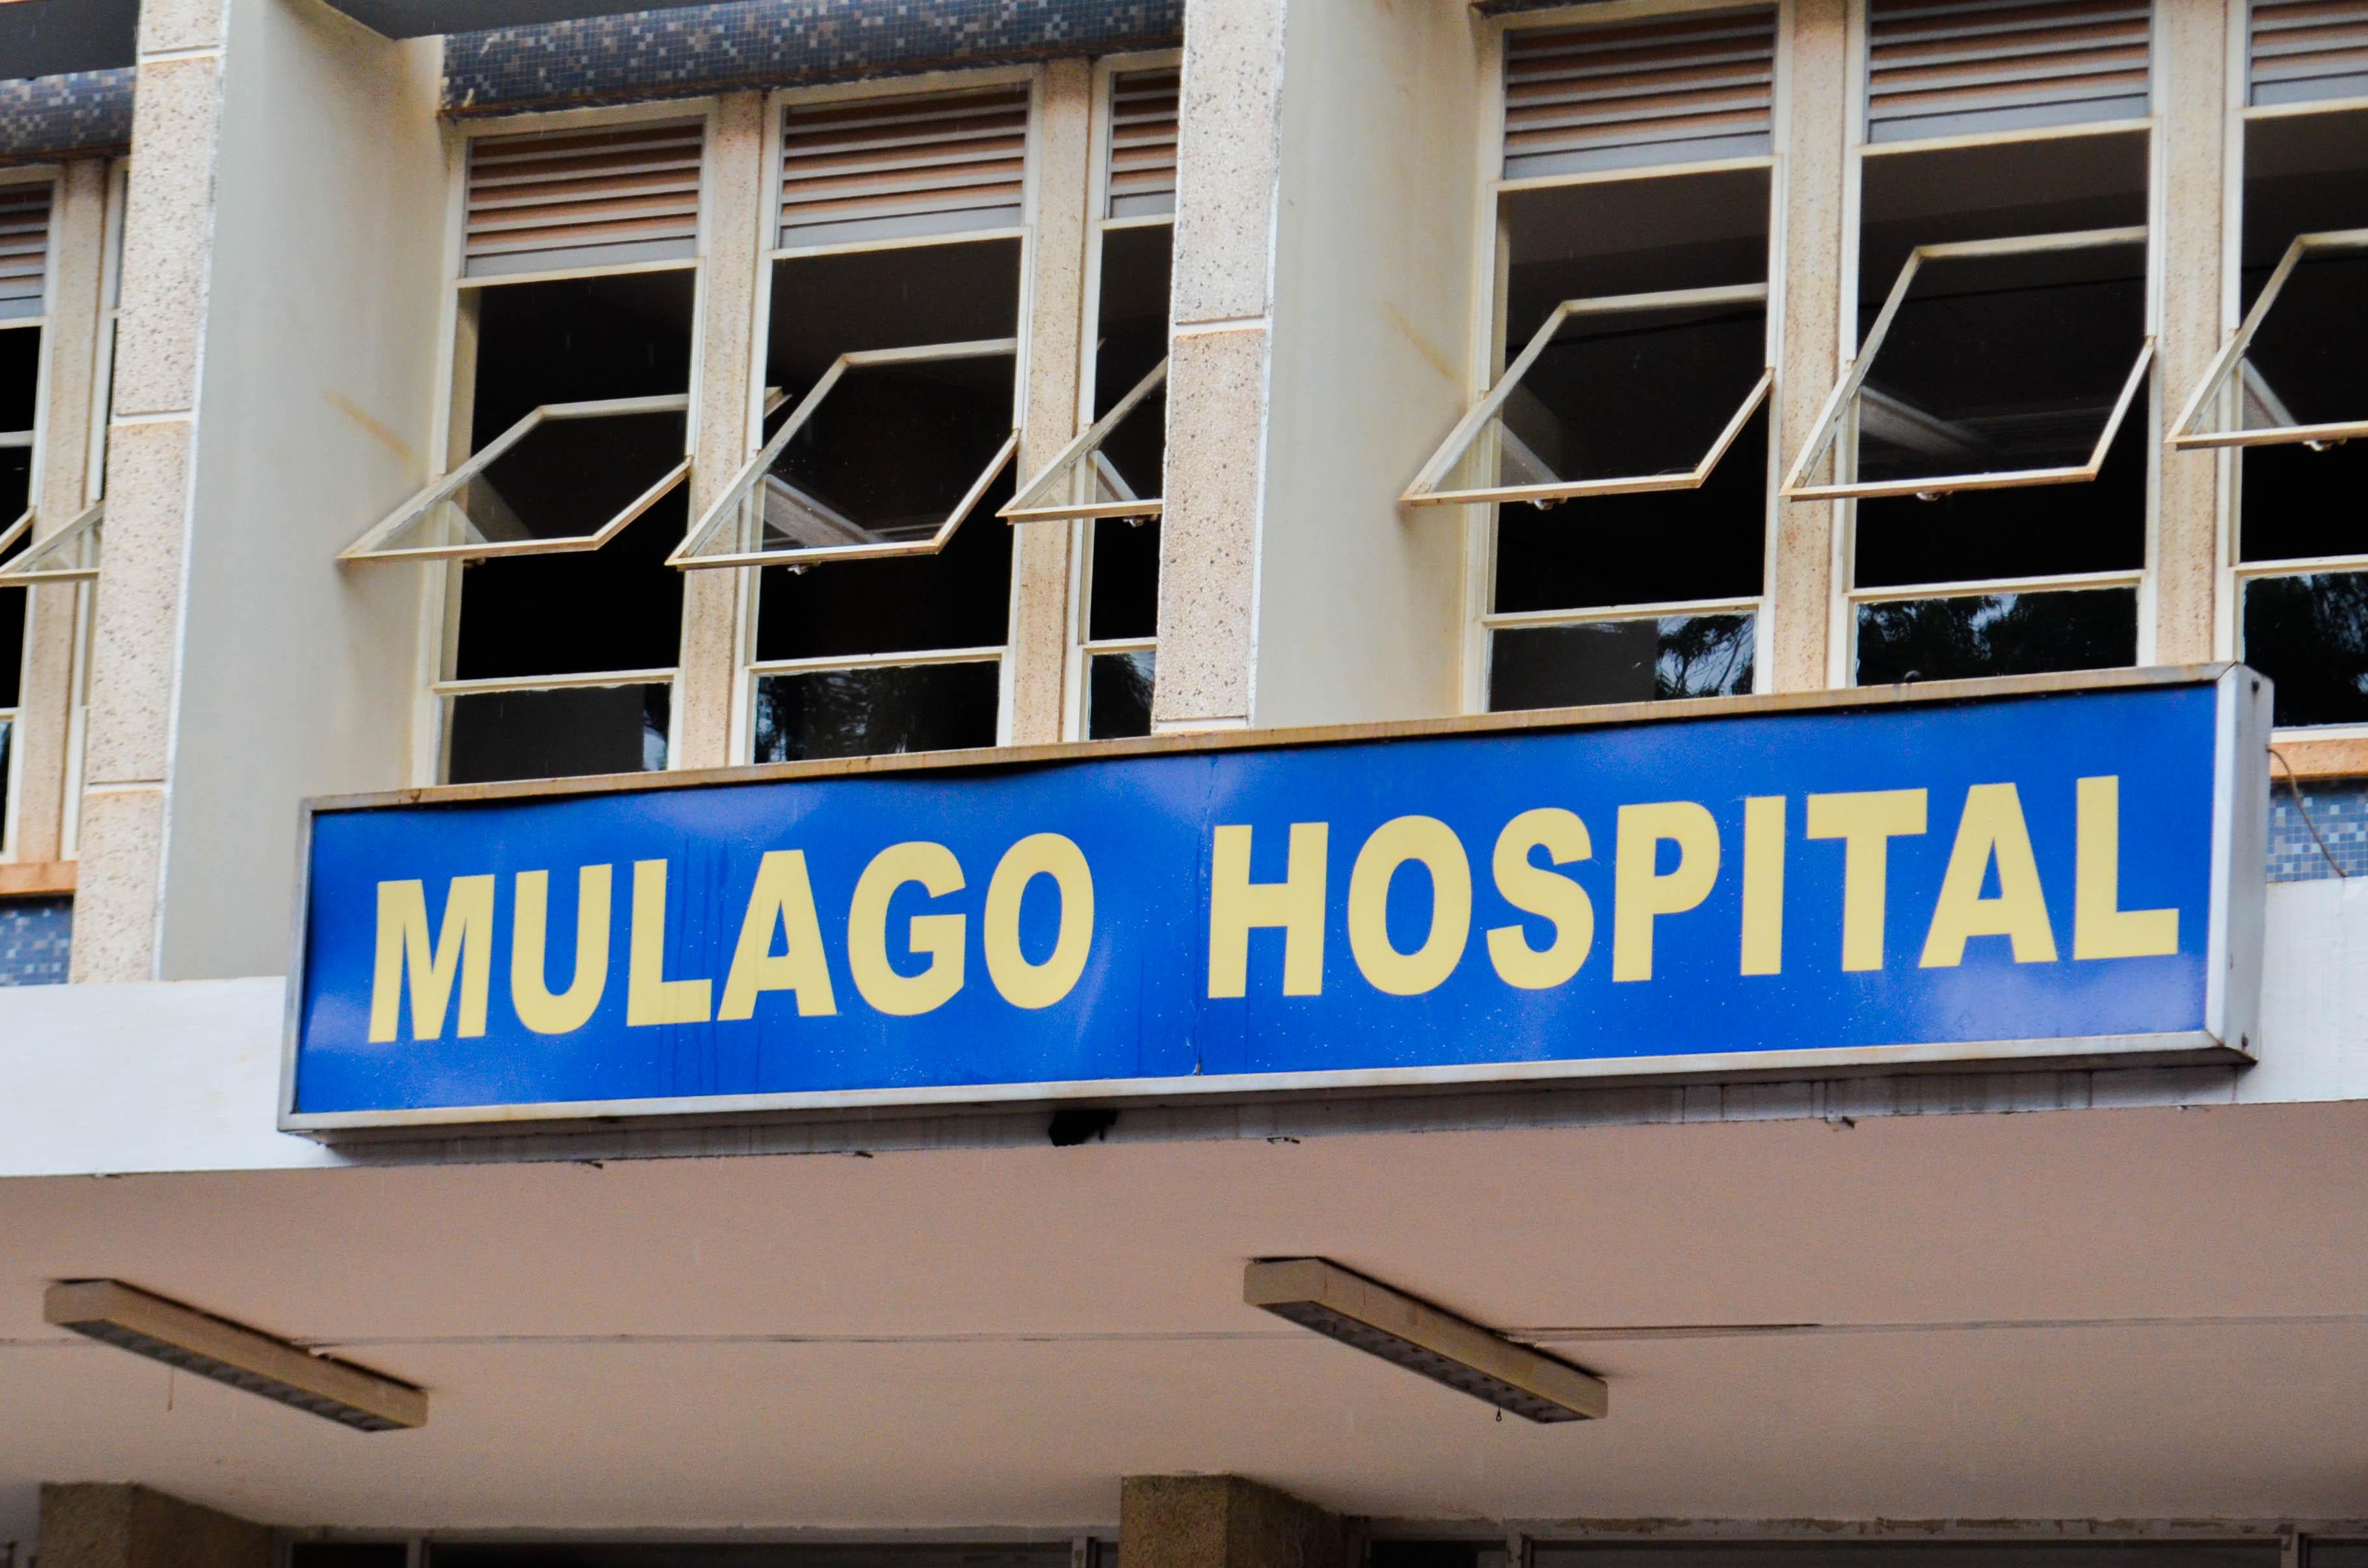 Mista Poa a Connu un Accident Mortel,il au Soin intensif à l'Hopital de Mulago à Kampala Uganda